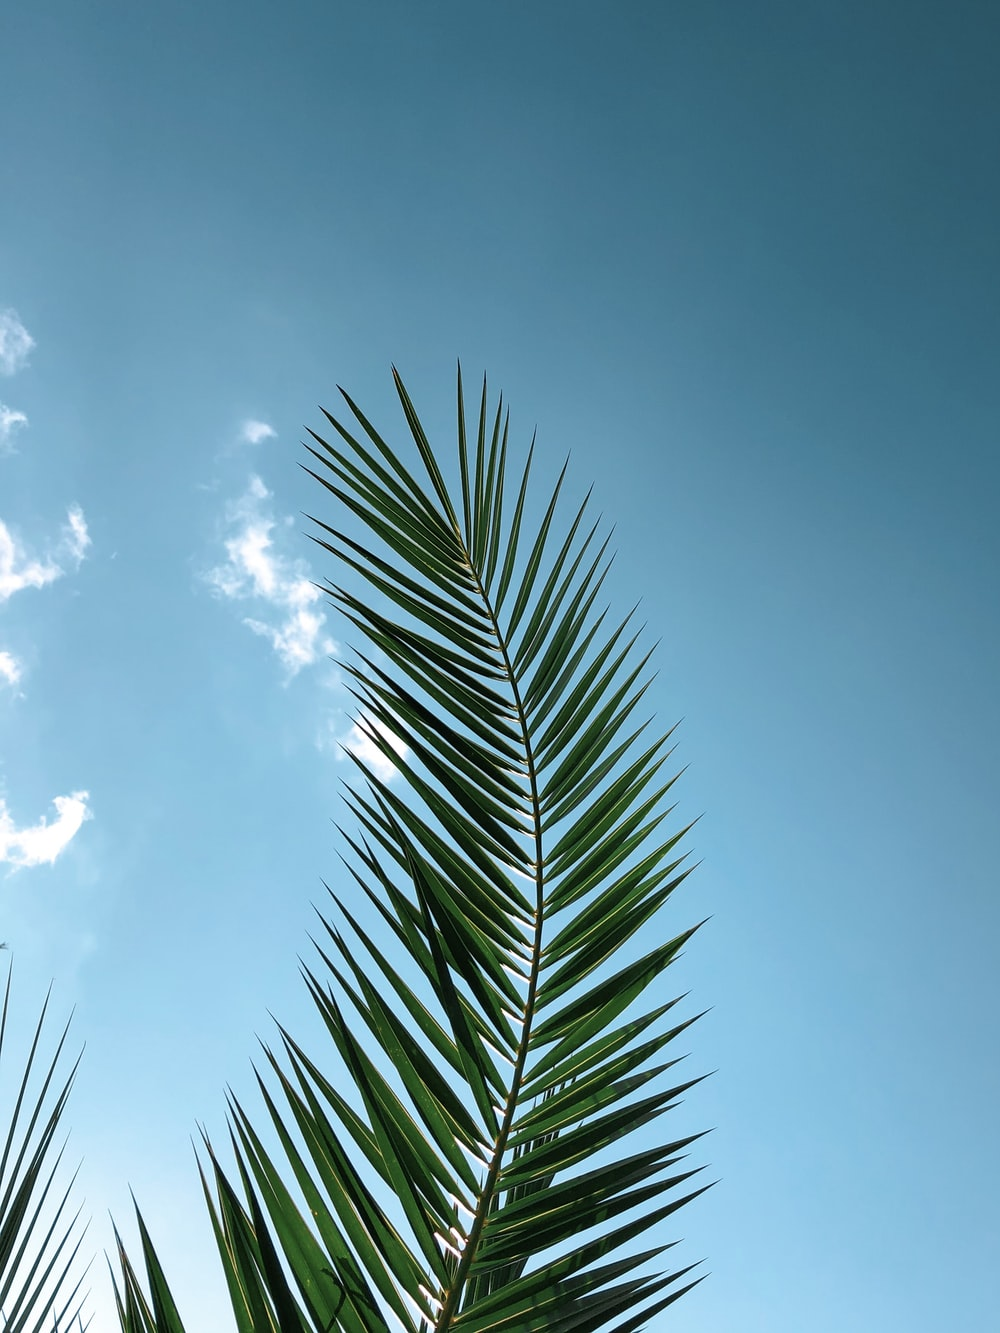 green-leafed plant during daytimne